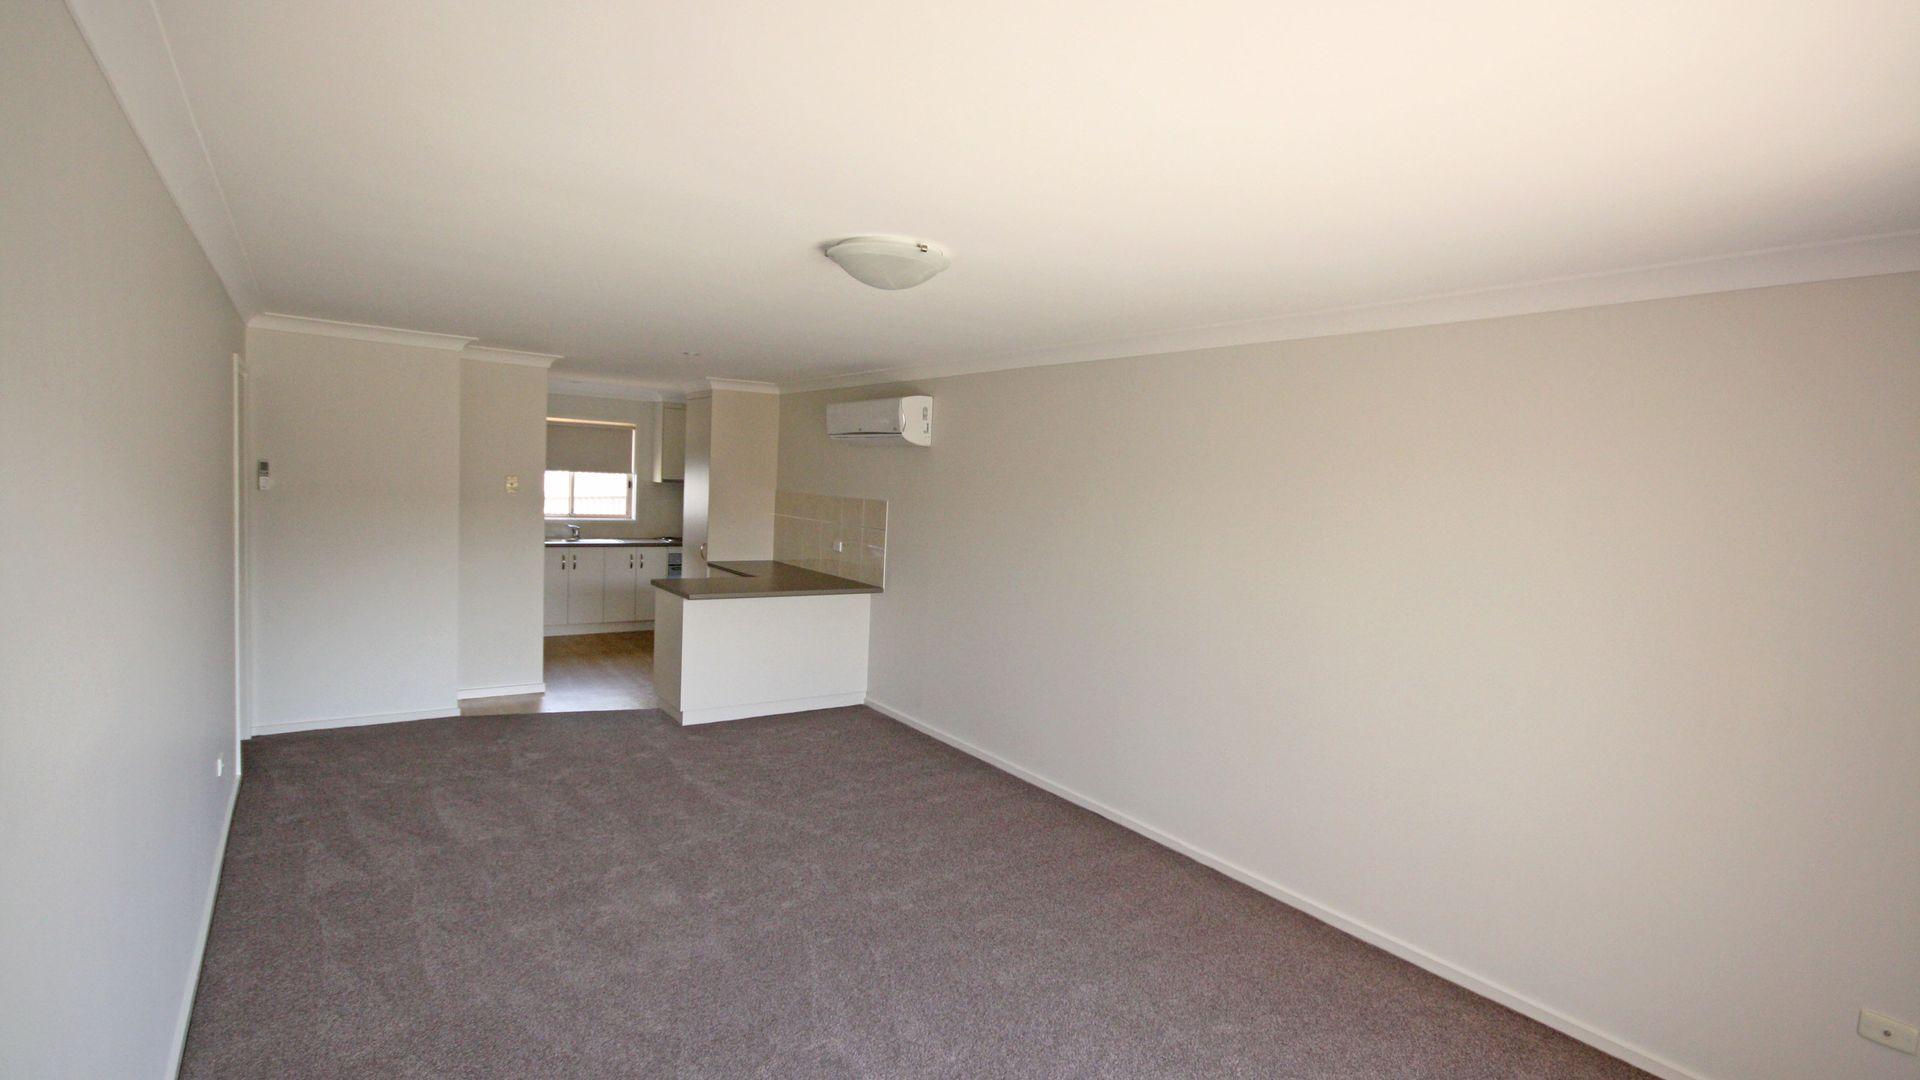 2/30 Kenneally Street, Kooringal NSW 2650, Image 2